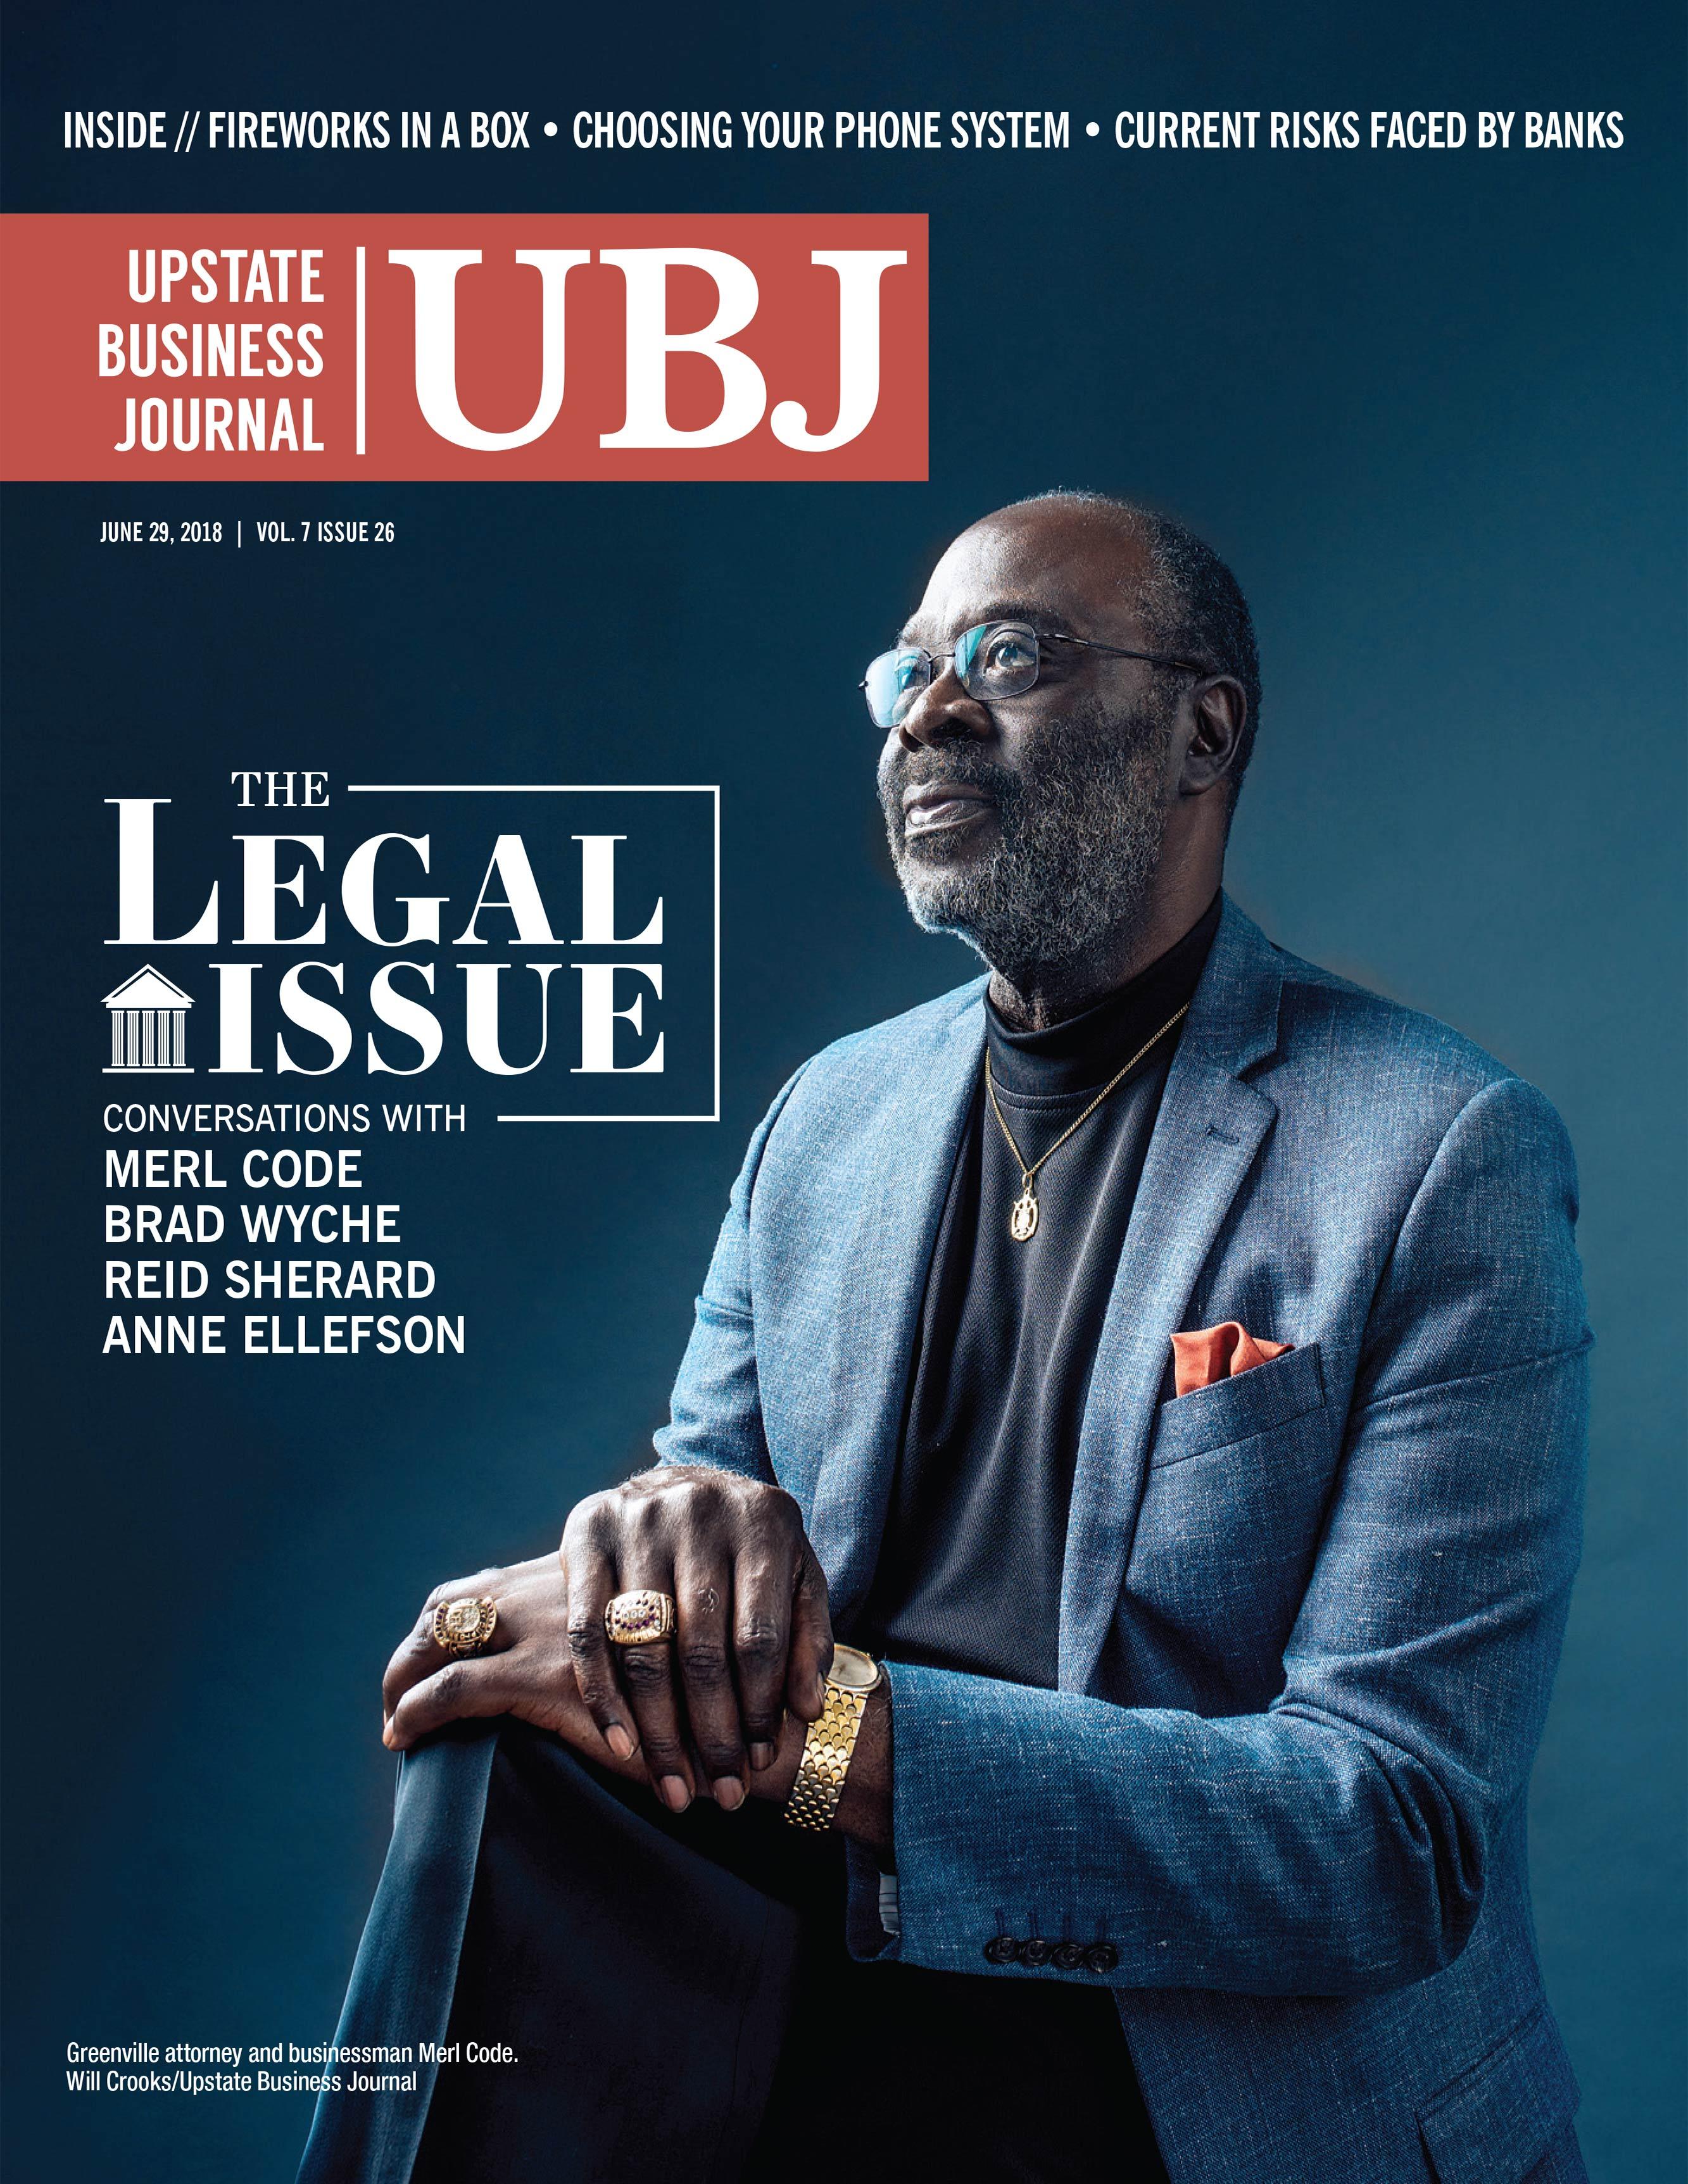 Jamey Fish entrepreneur story in UBJ Business Journal.